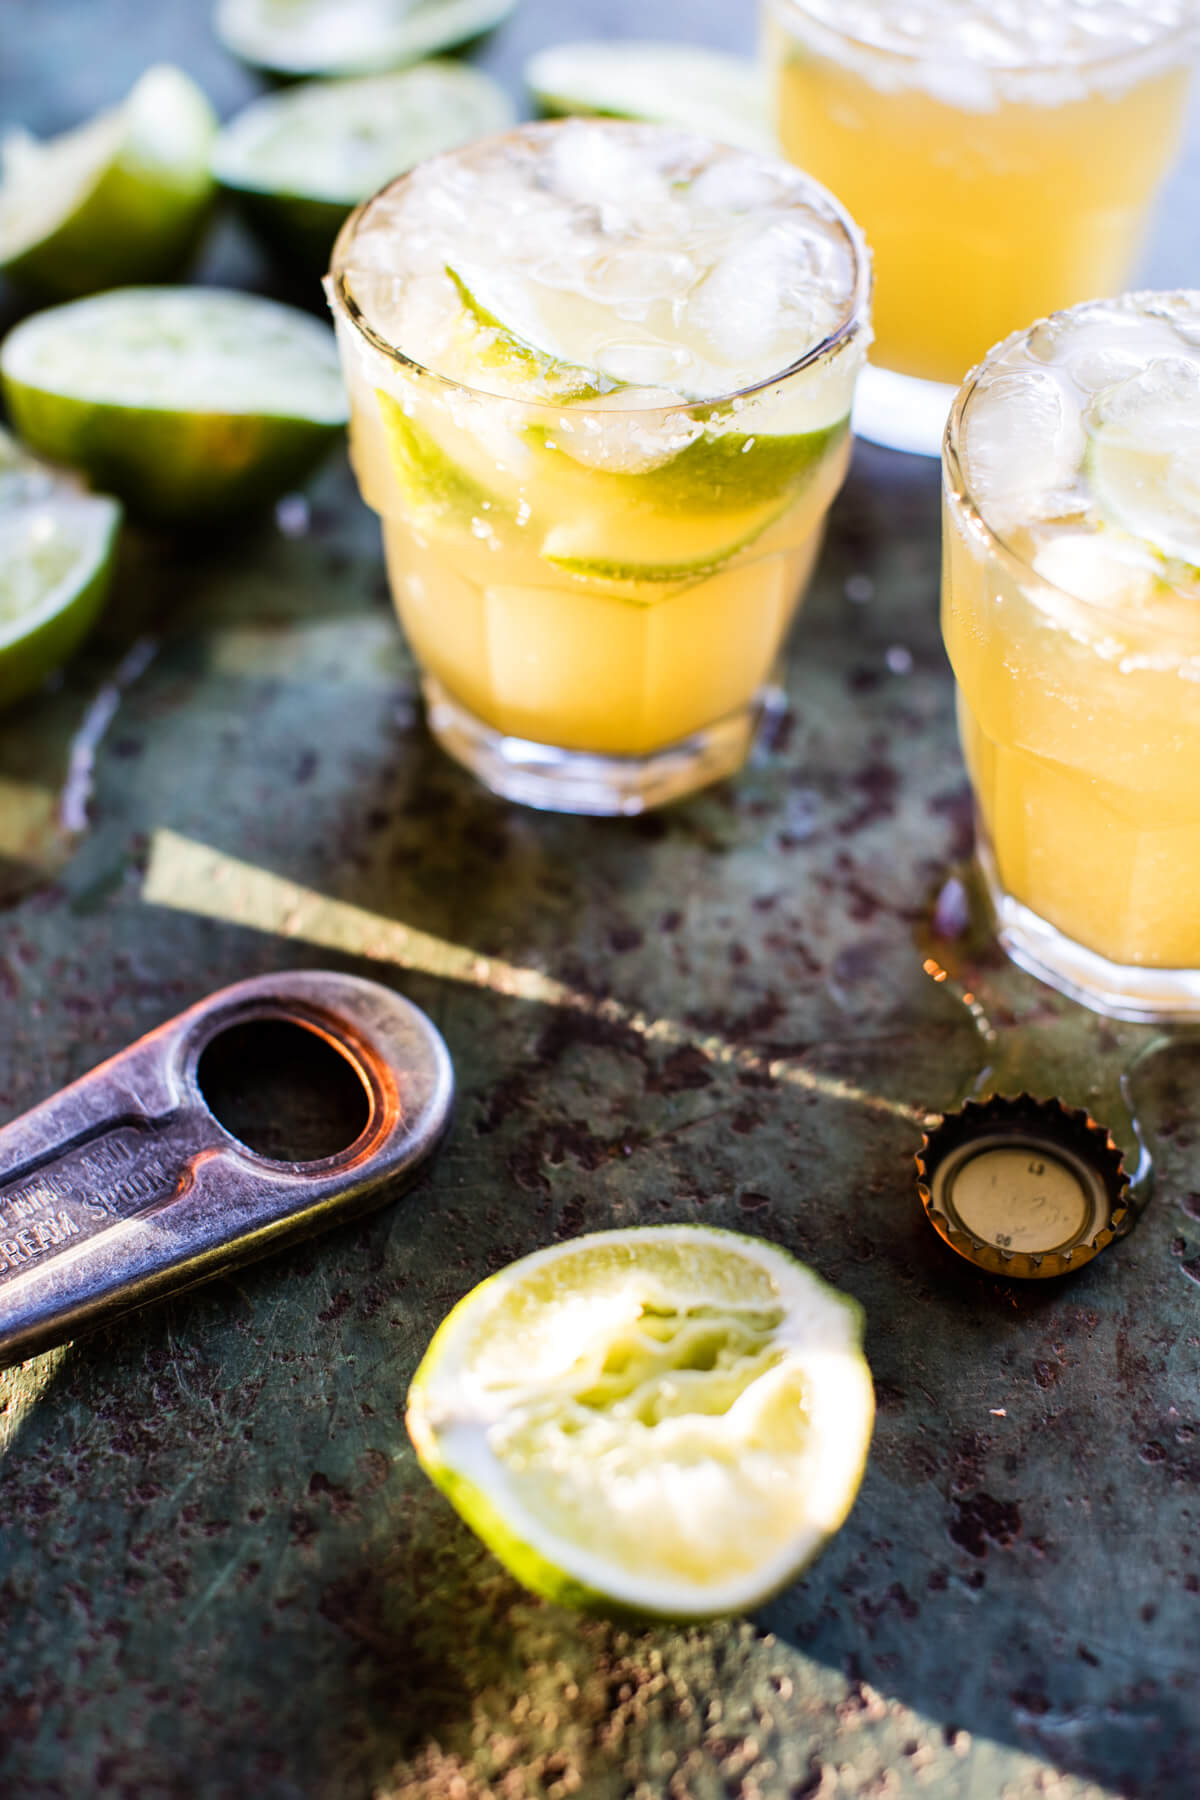 Pineapple Lime Beer Margaritas | Half Baked Harvest - Pinterest Picks - Cinco de Mayo Ready Margarita Recipes